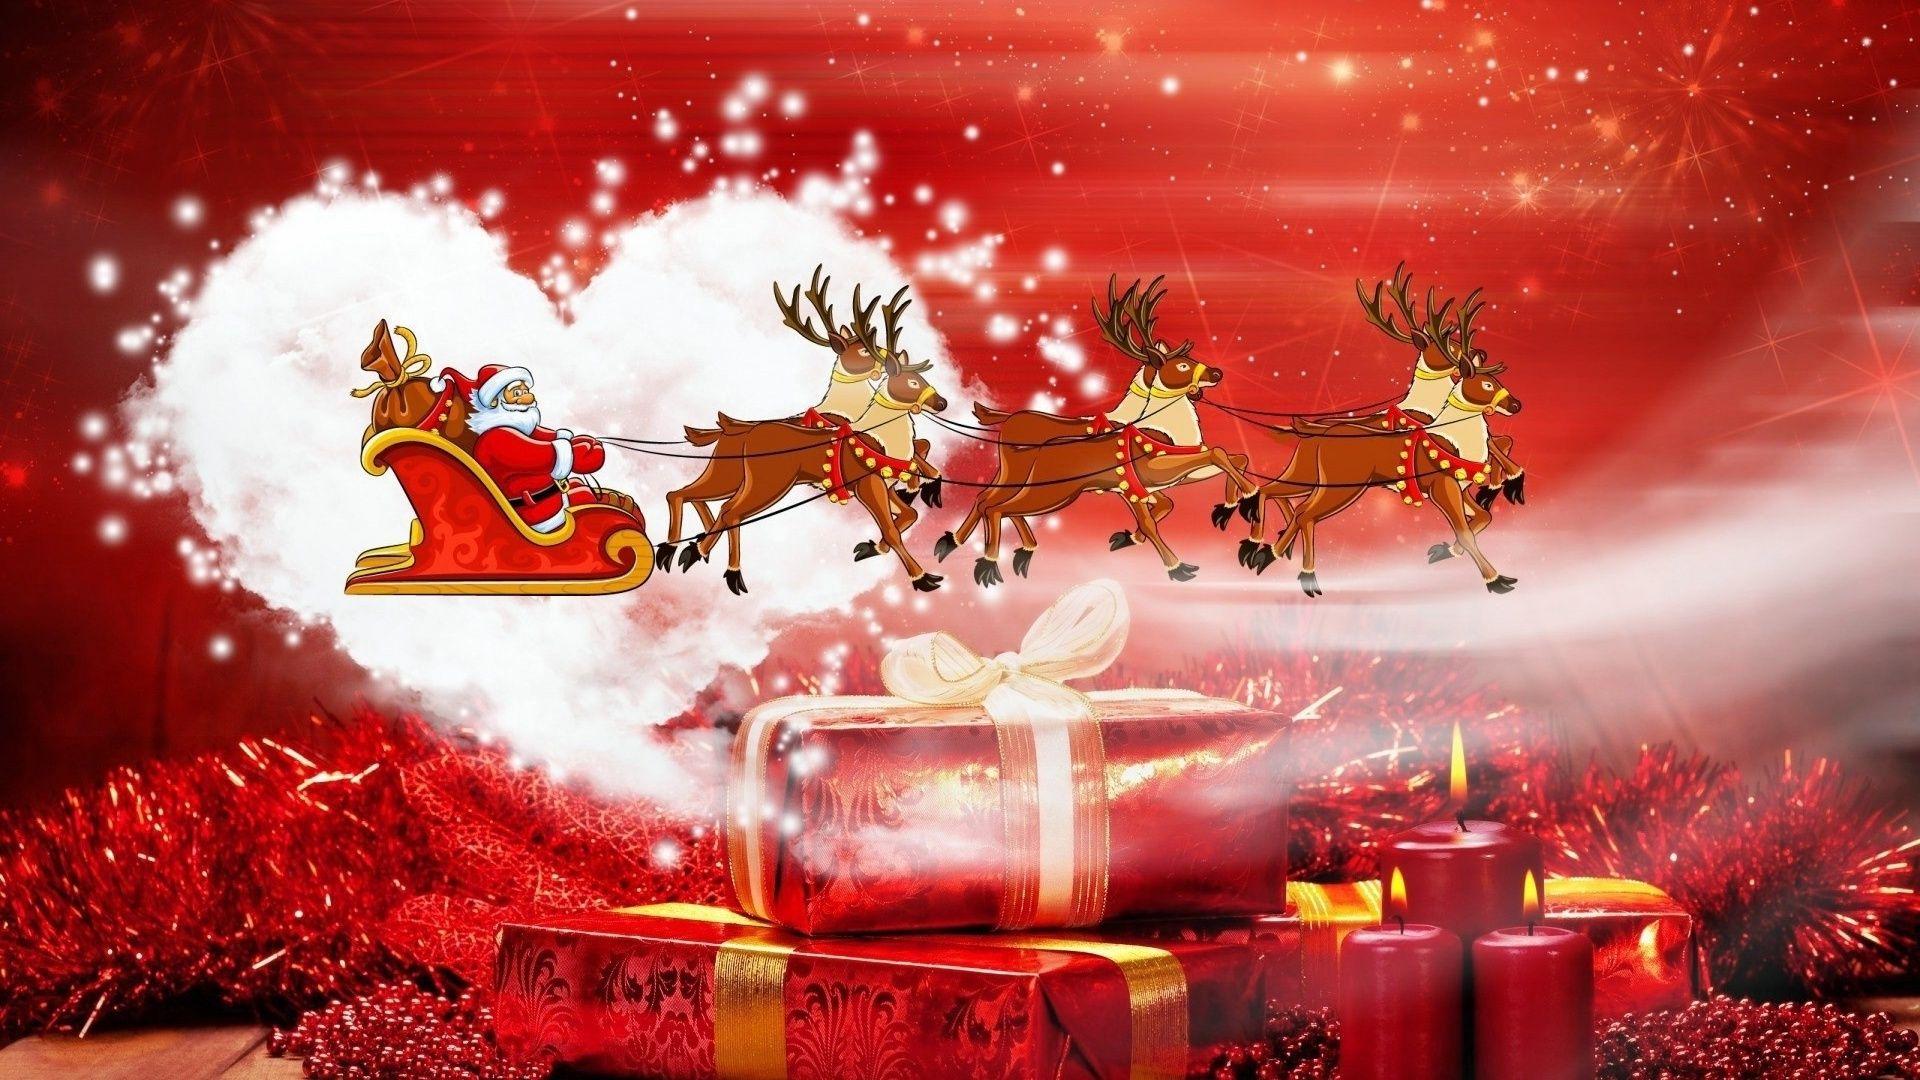 Christmas Sleigh hd wallpaper download